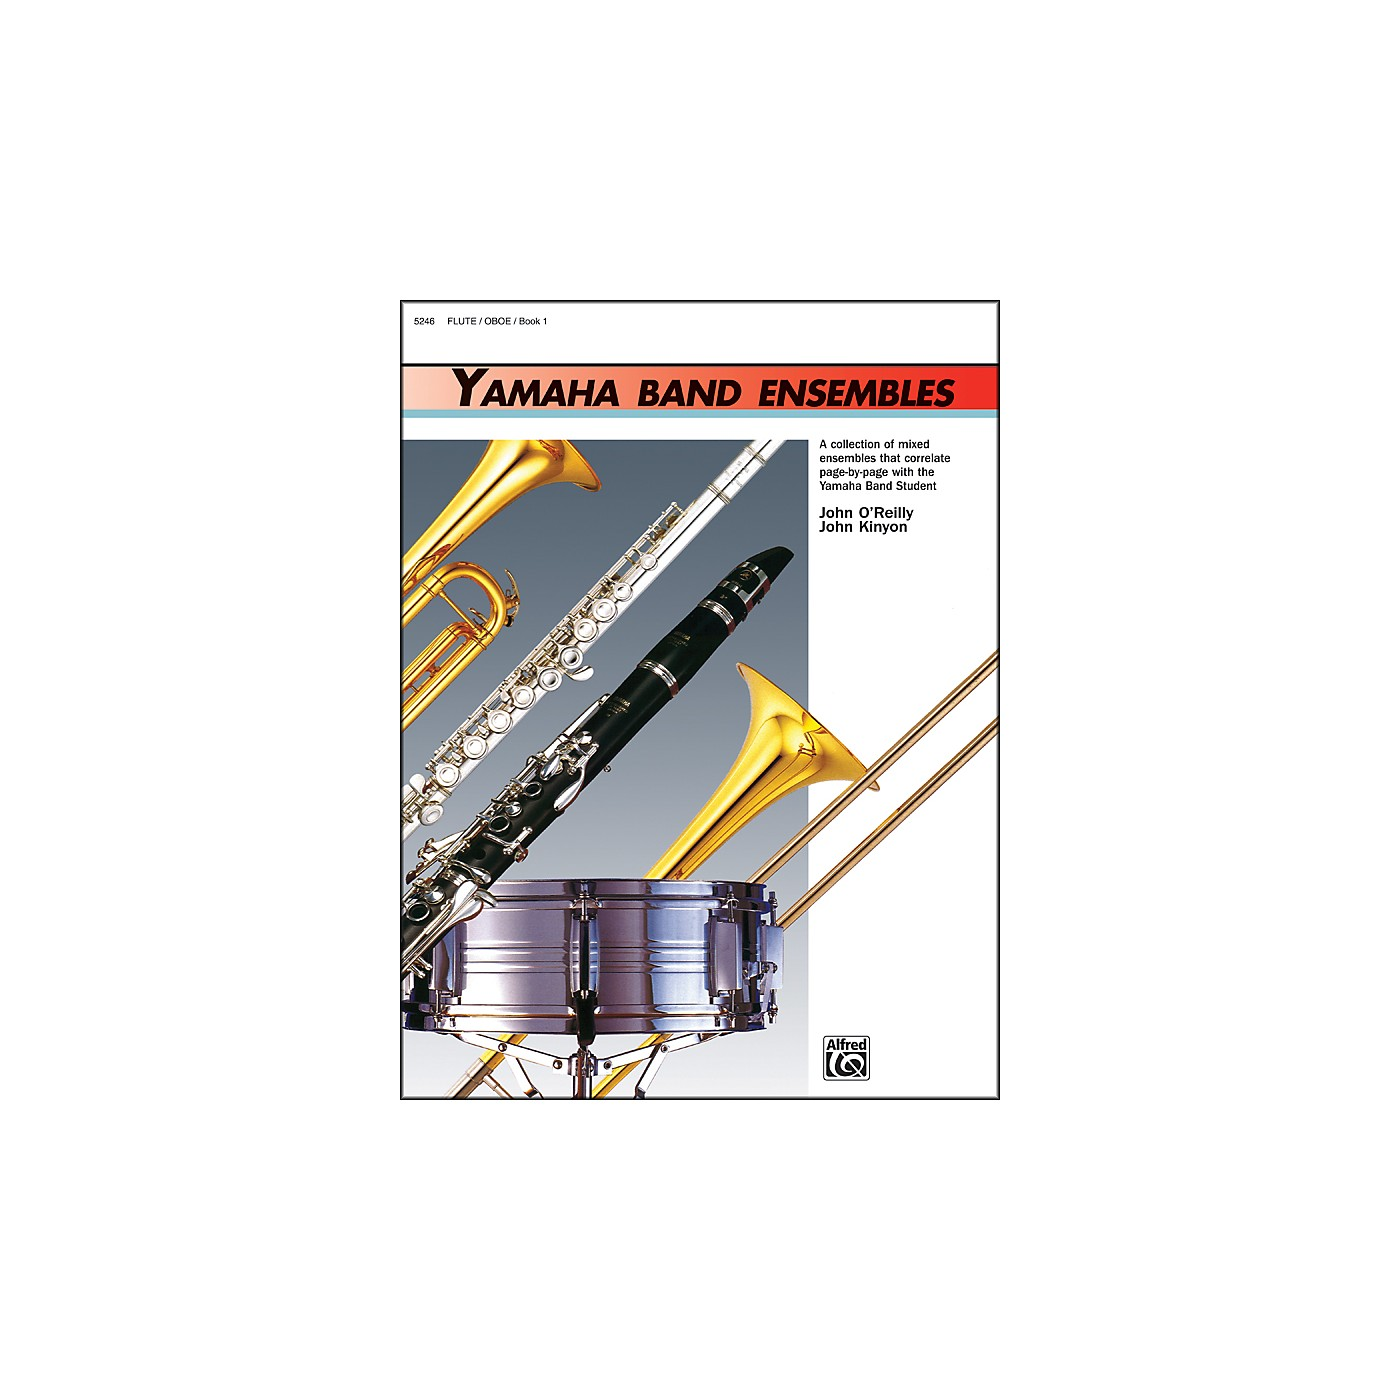 Alfred Yamaha Band Ensembles Book 1 Flute Oboe thumbnail